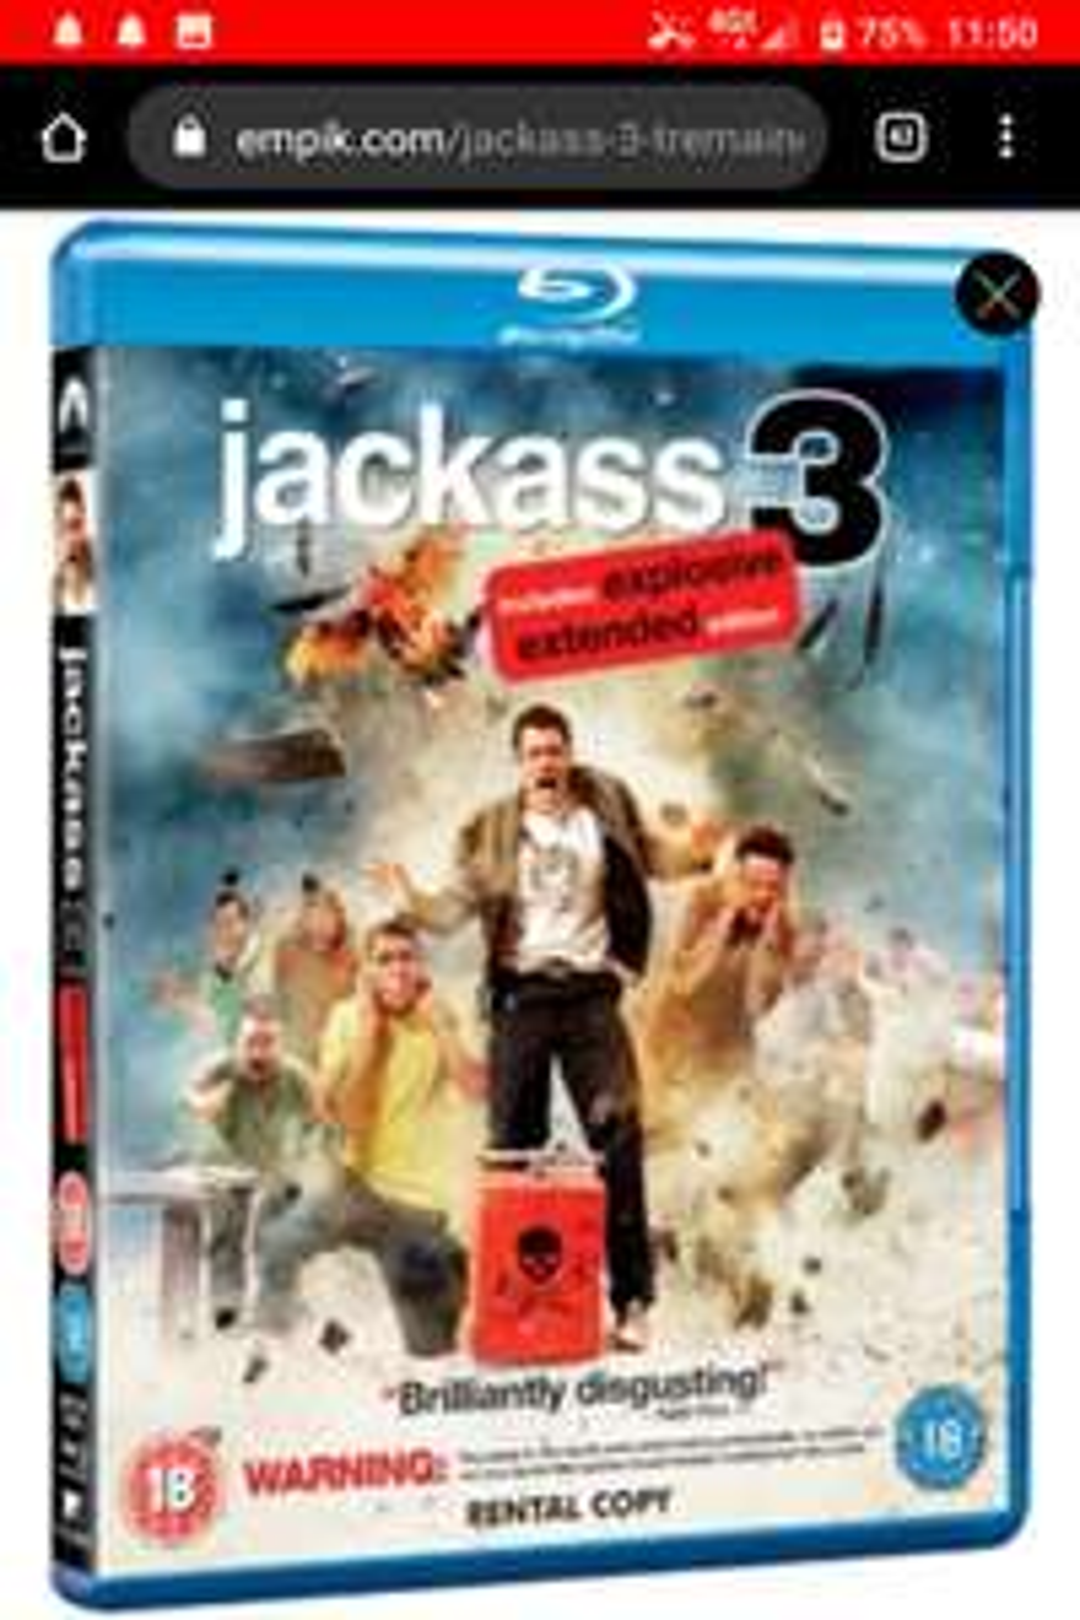 Jackass 3 Blu Ray